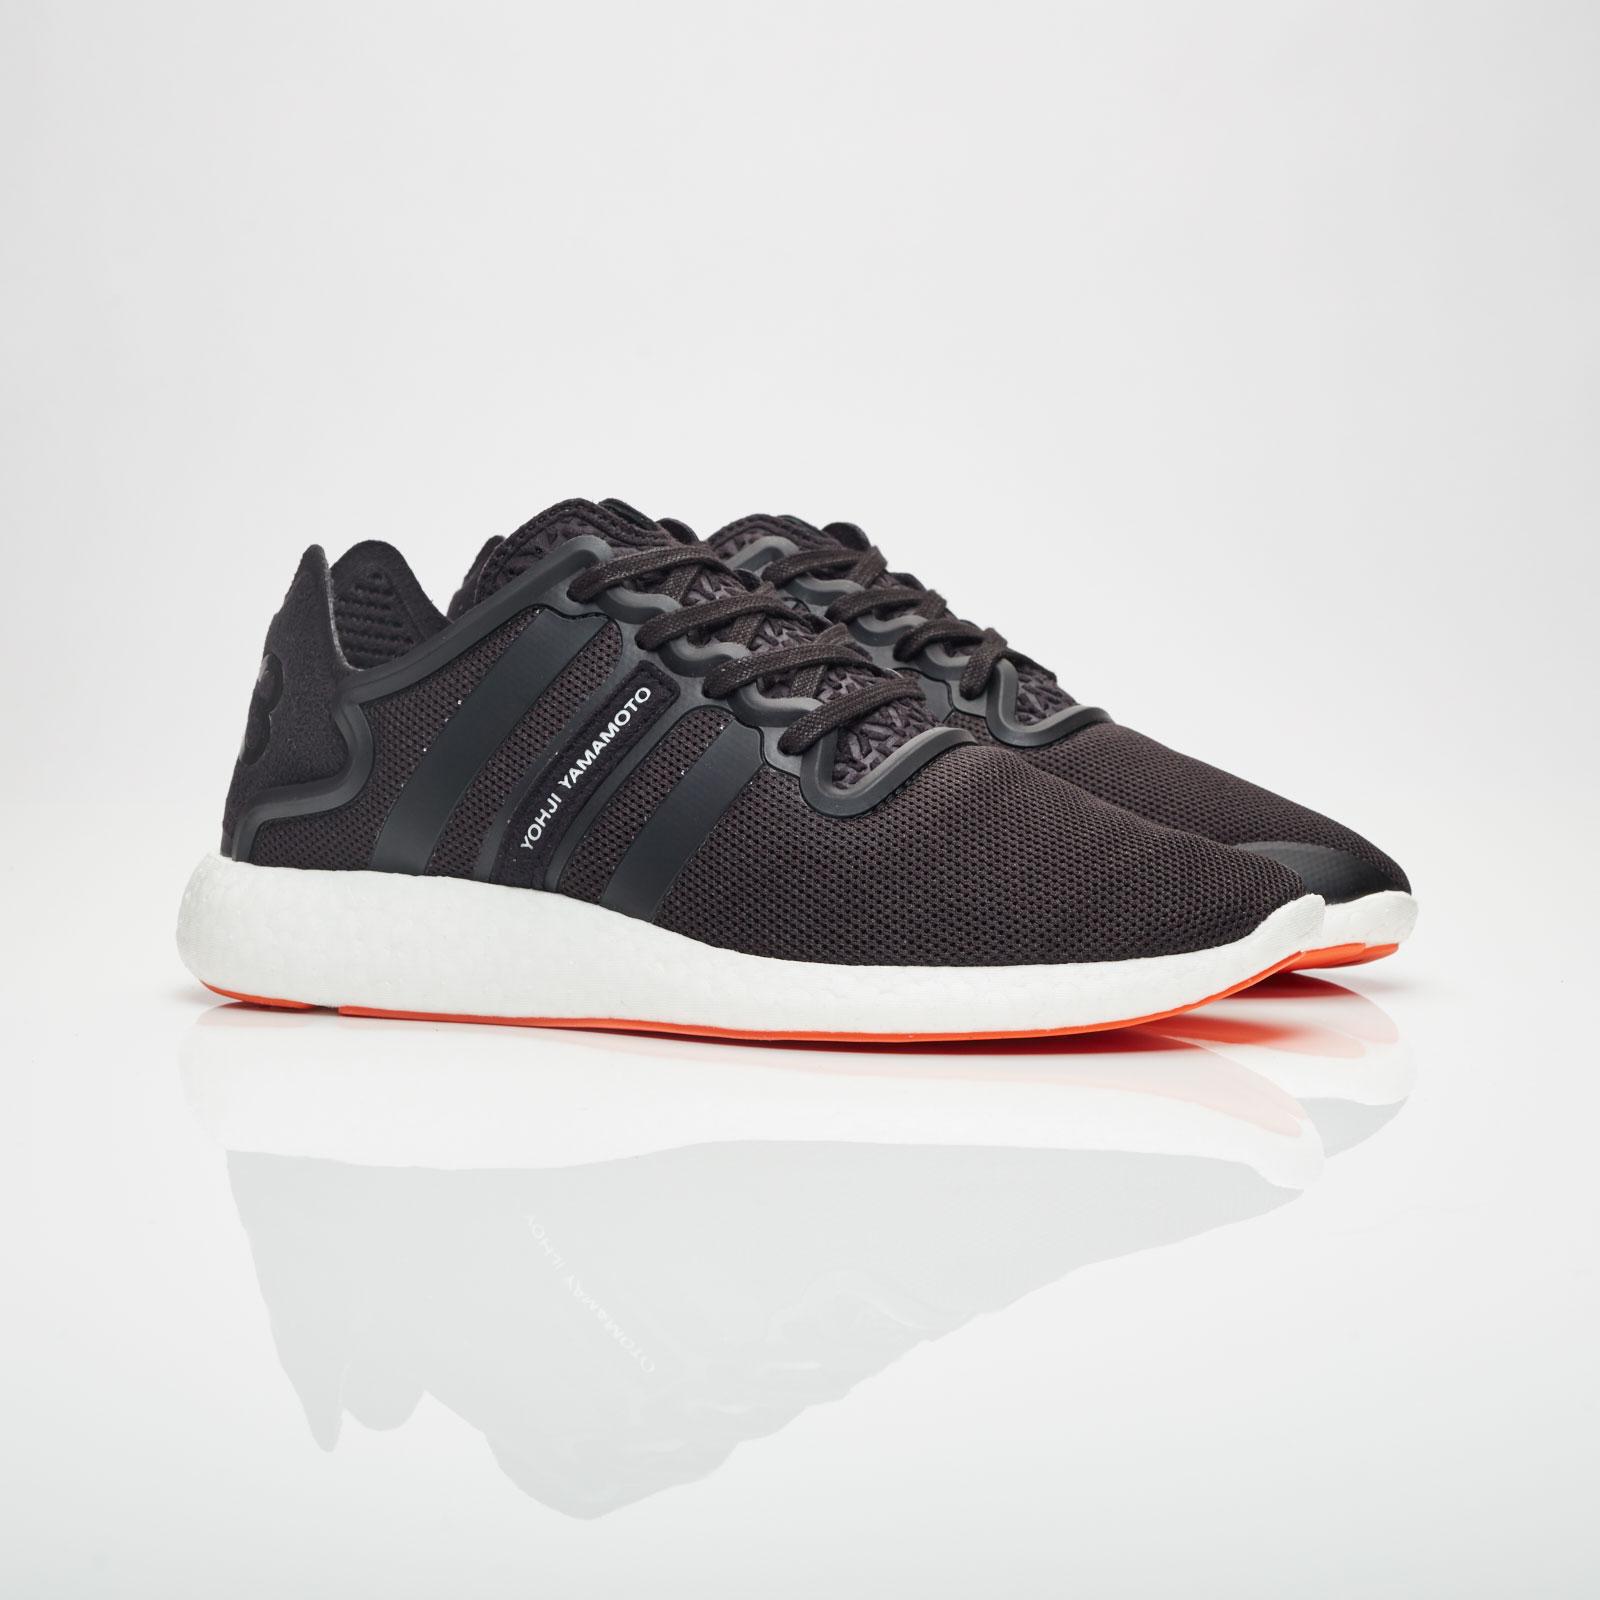 d09cacd29ab4 adidas Yohji Run - Cg3212 - Sneakersnstuff